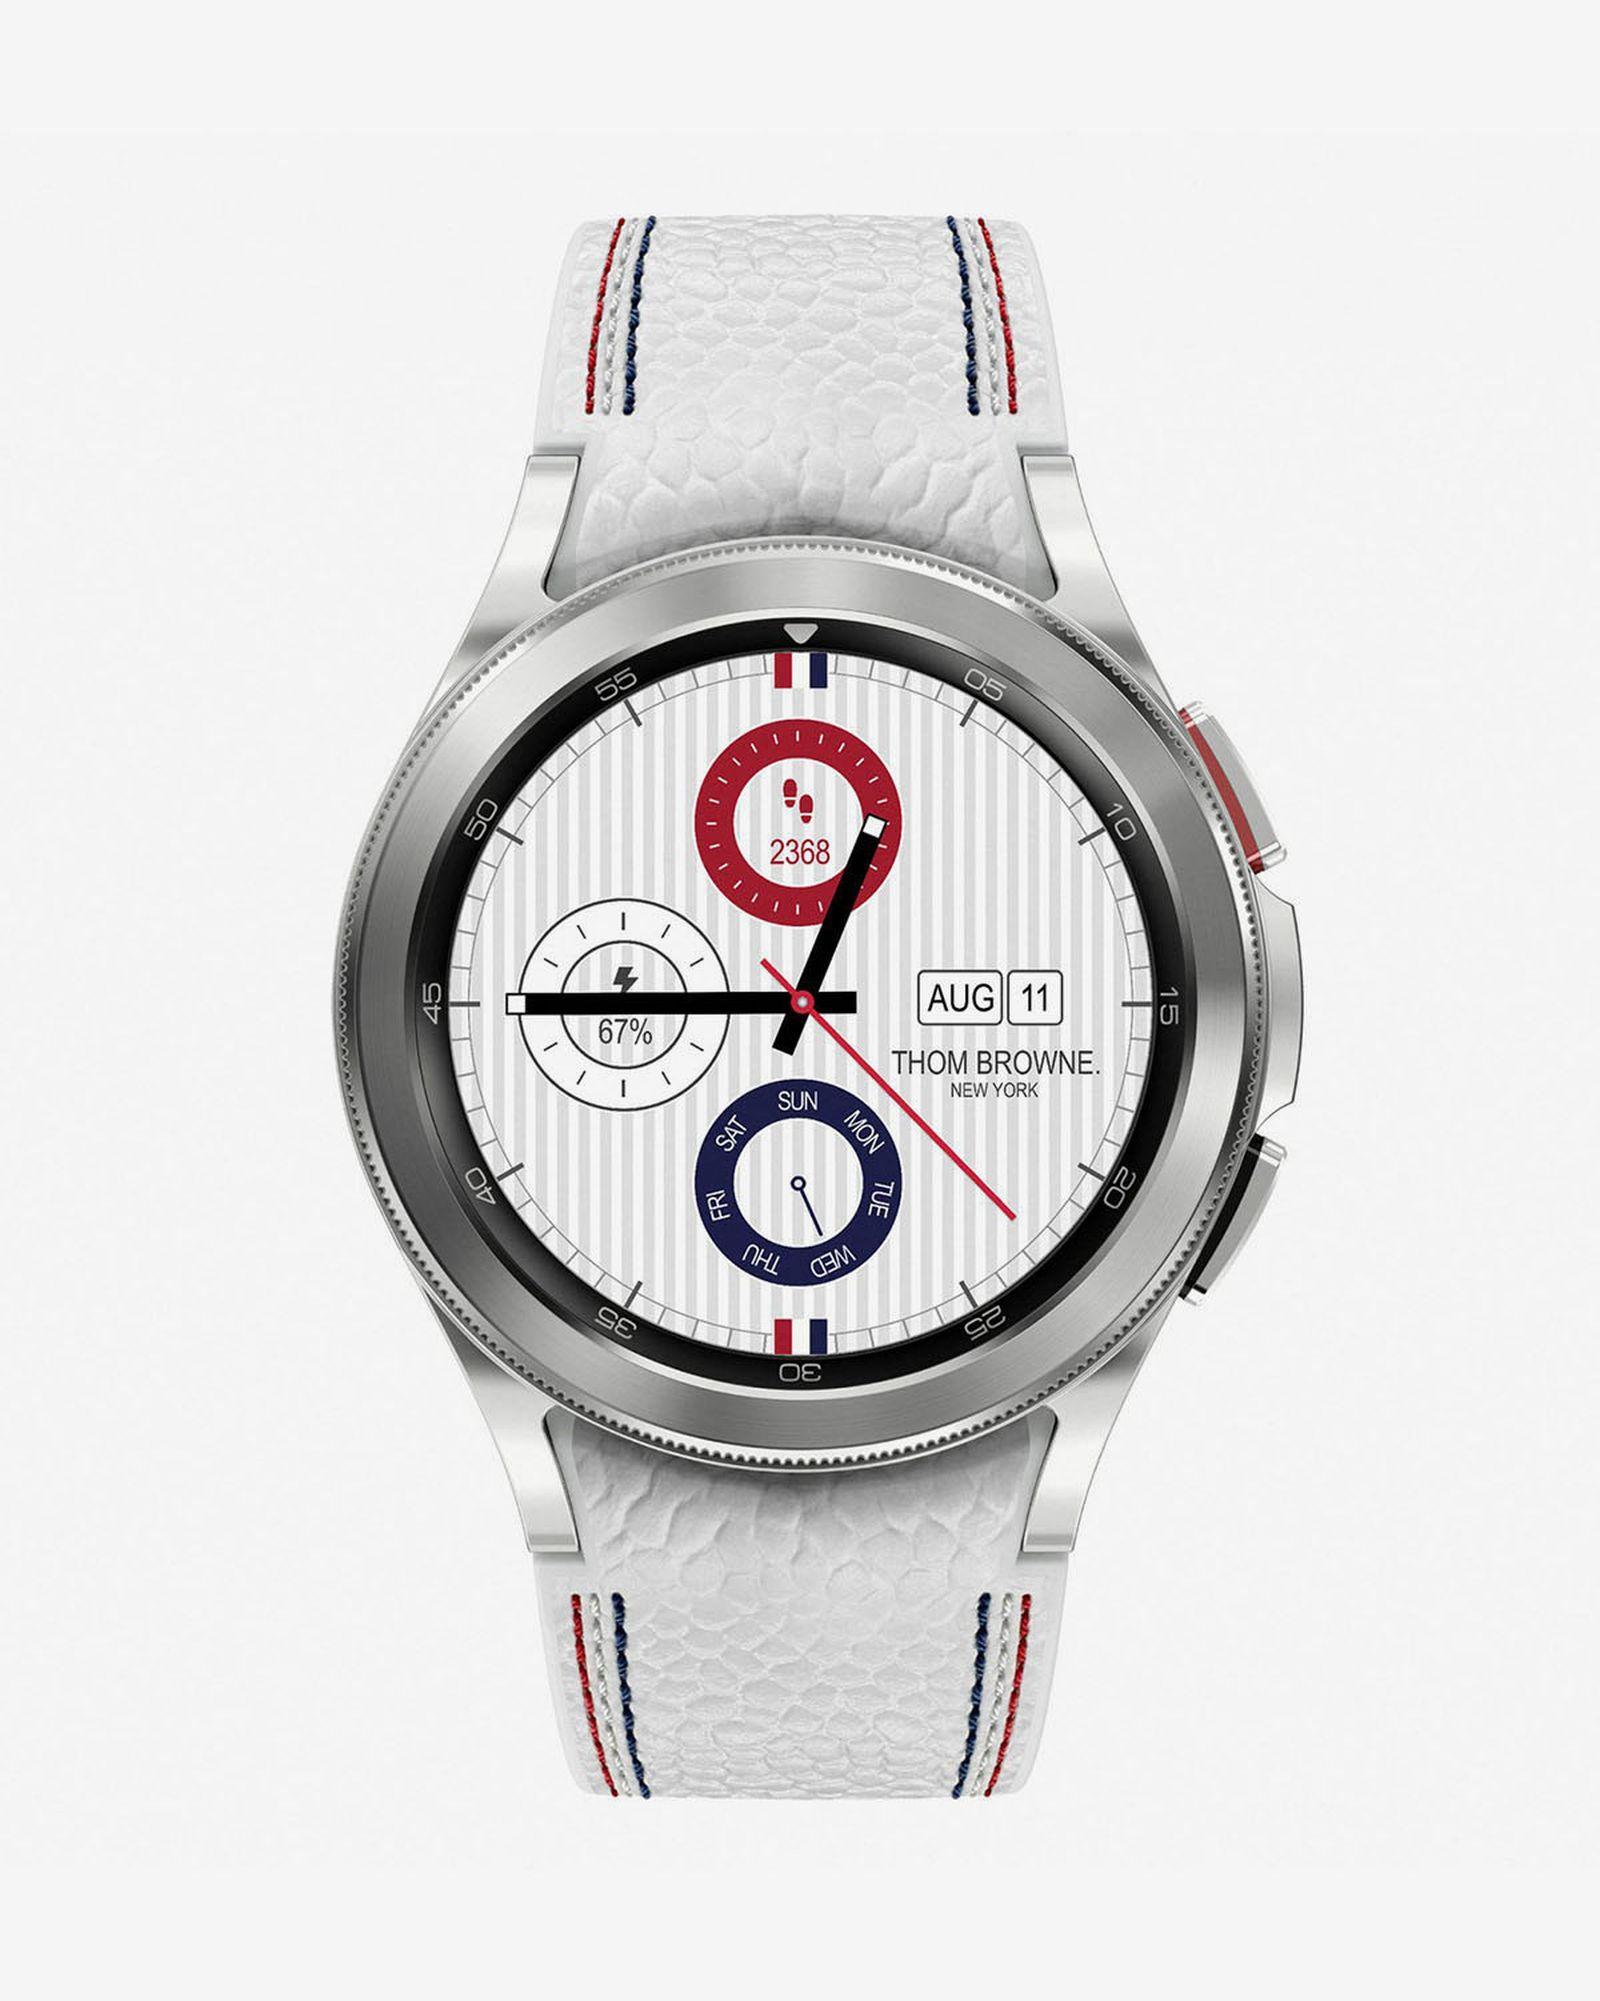 thom-browne-samsung-watch-03